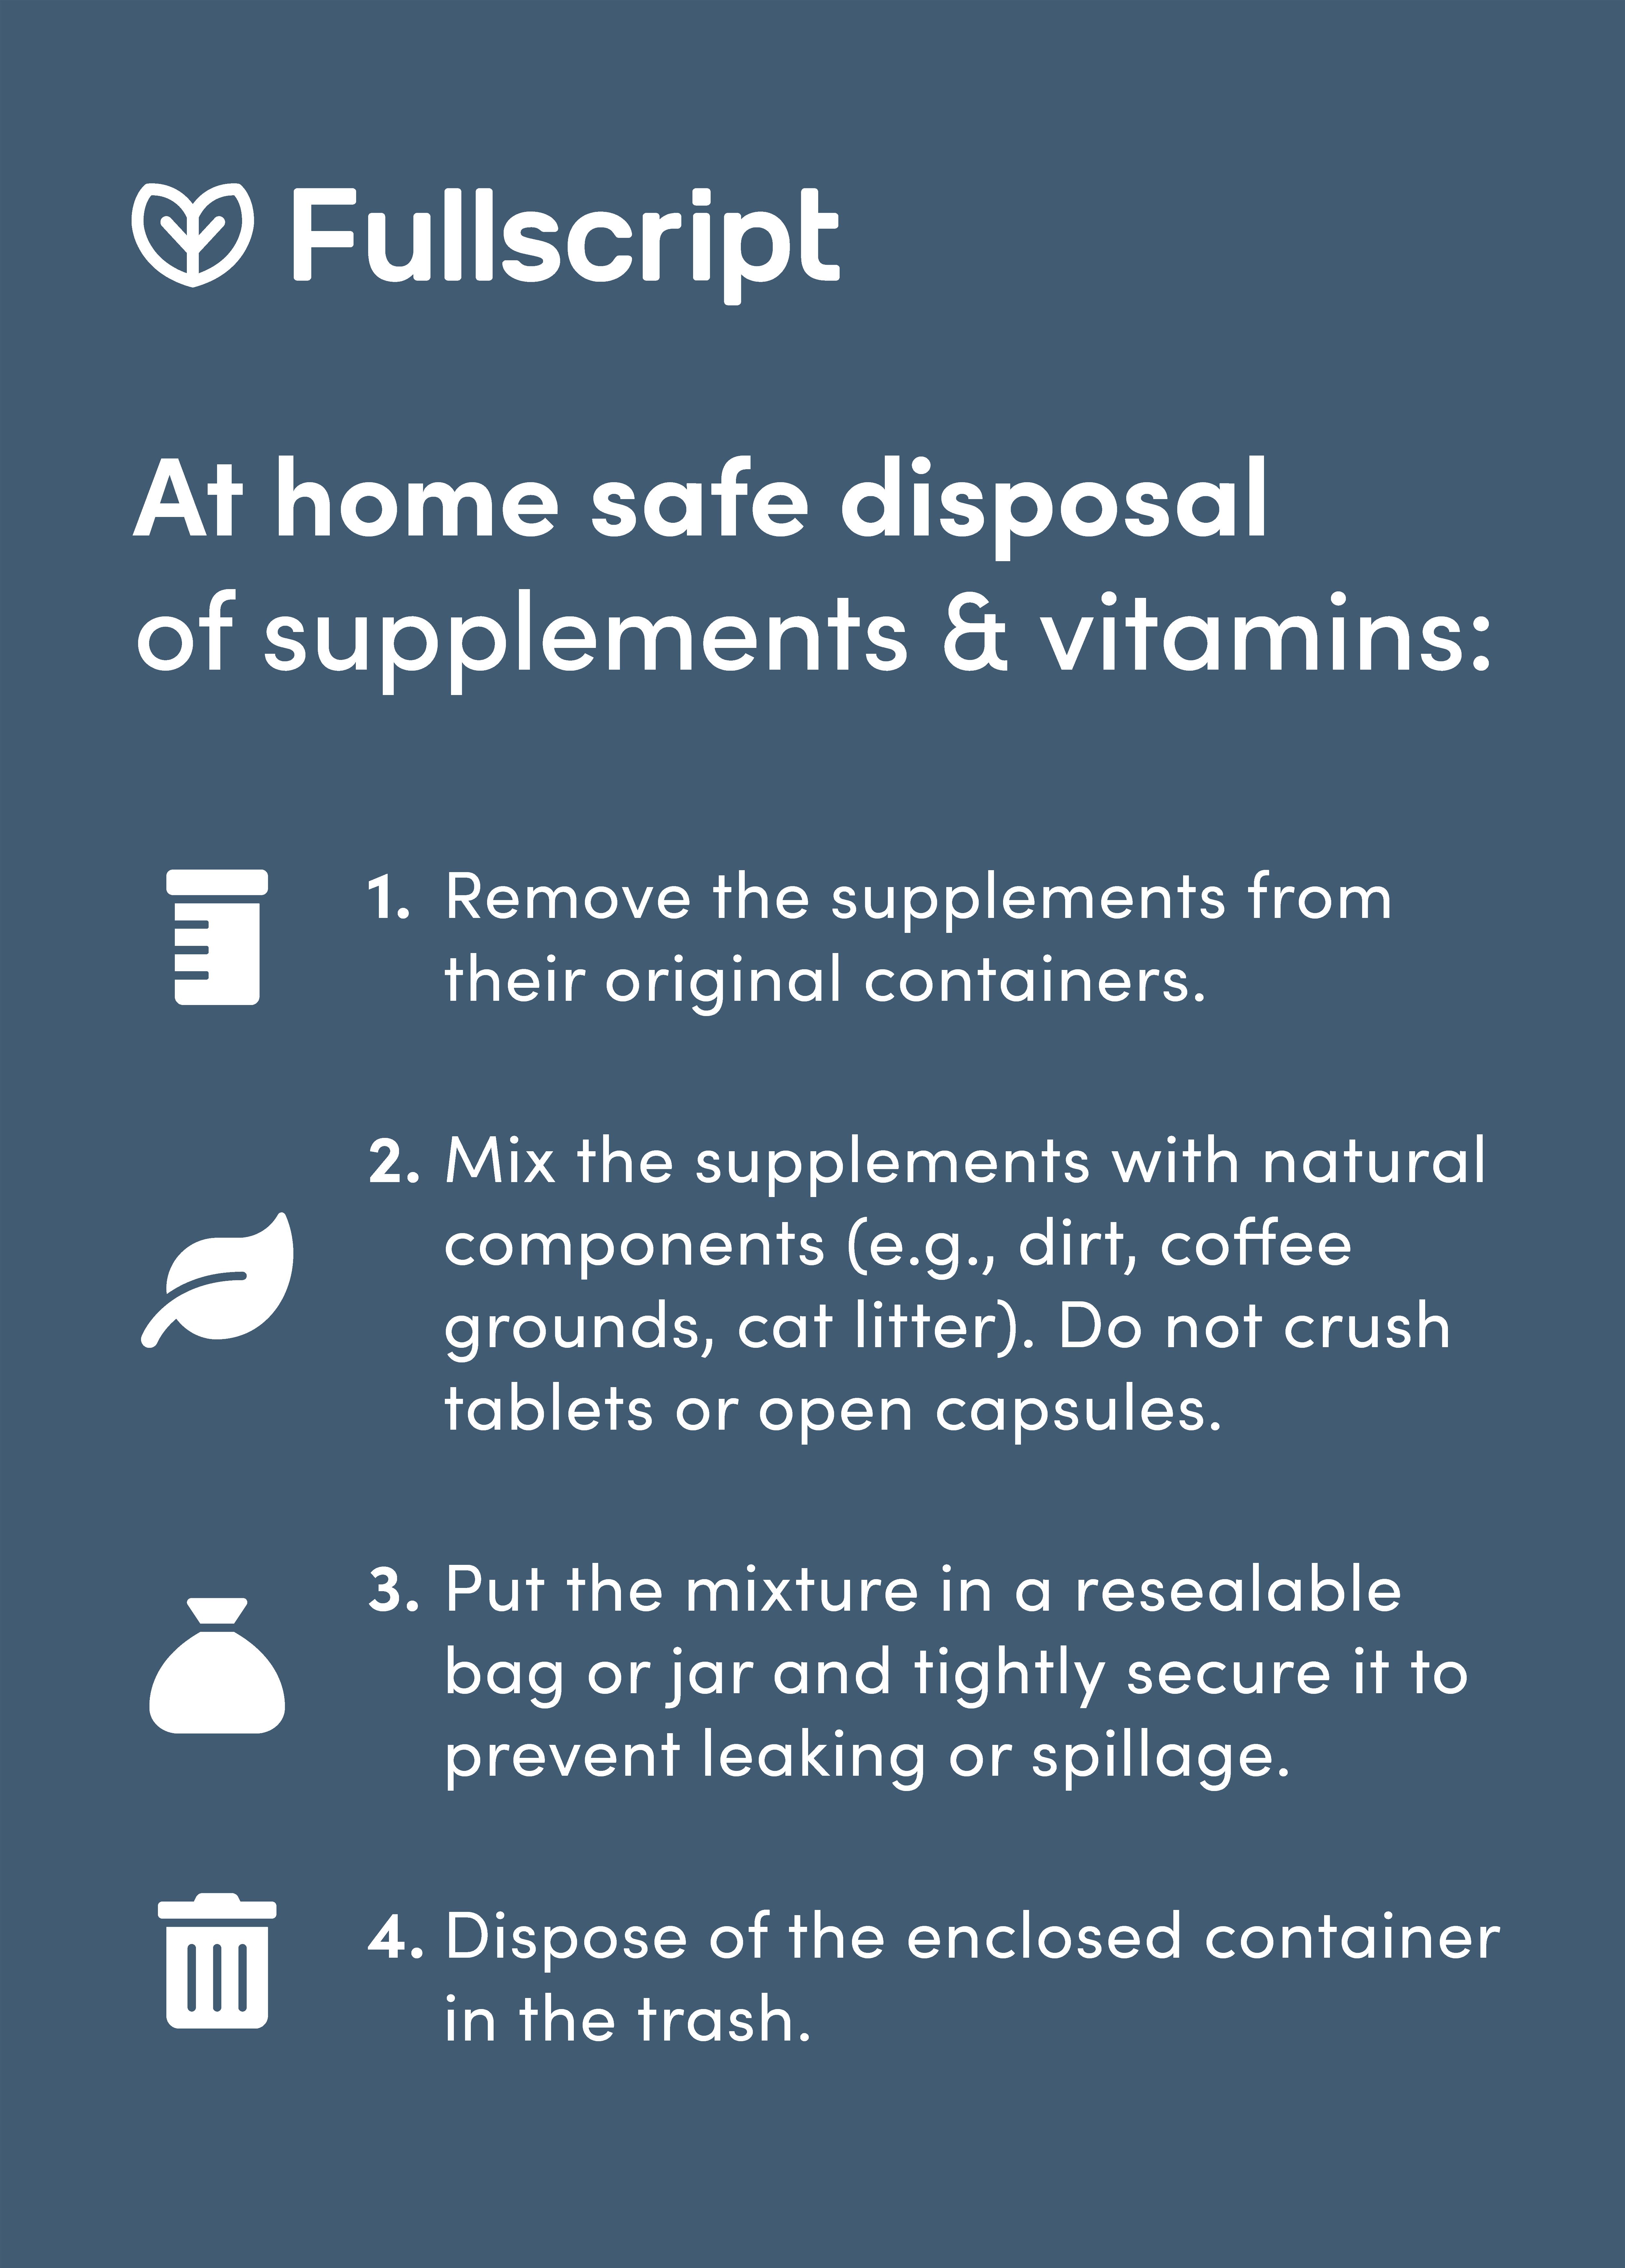 Supplement disposal infographic